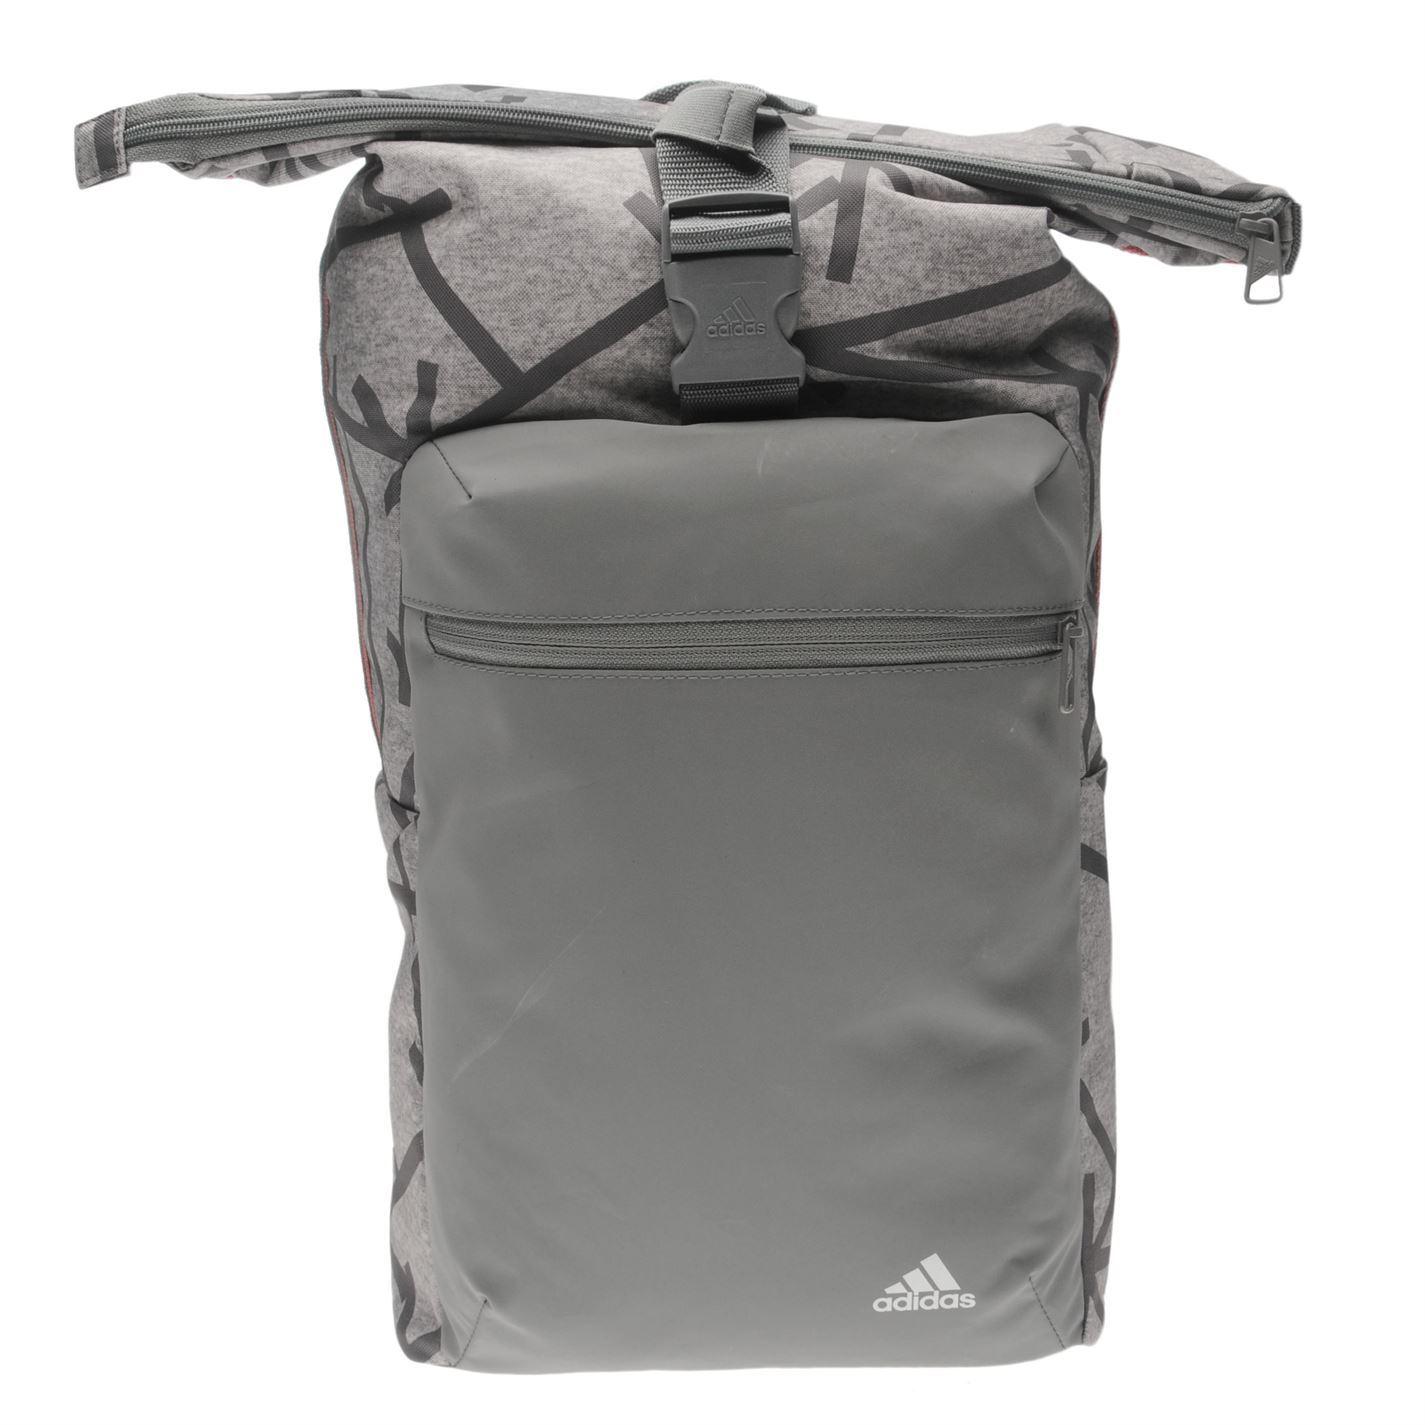 Adidas Sports Bags Singapore  8661fbbad8220